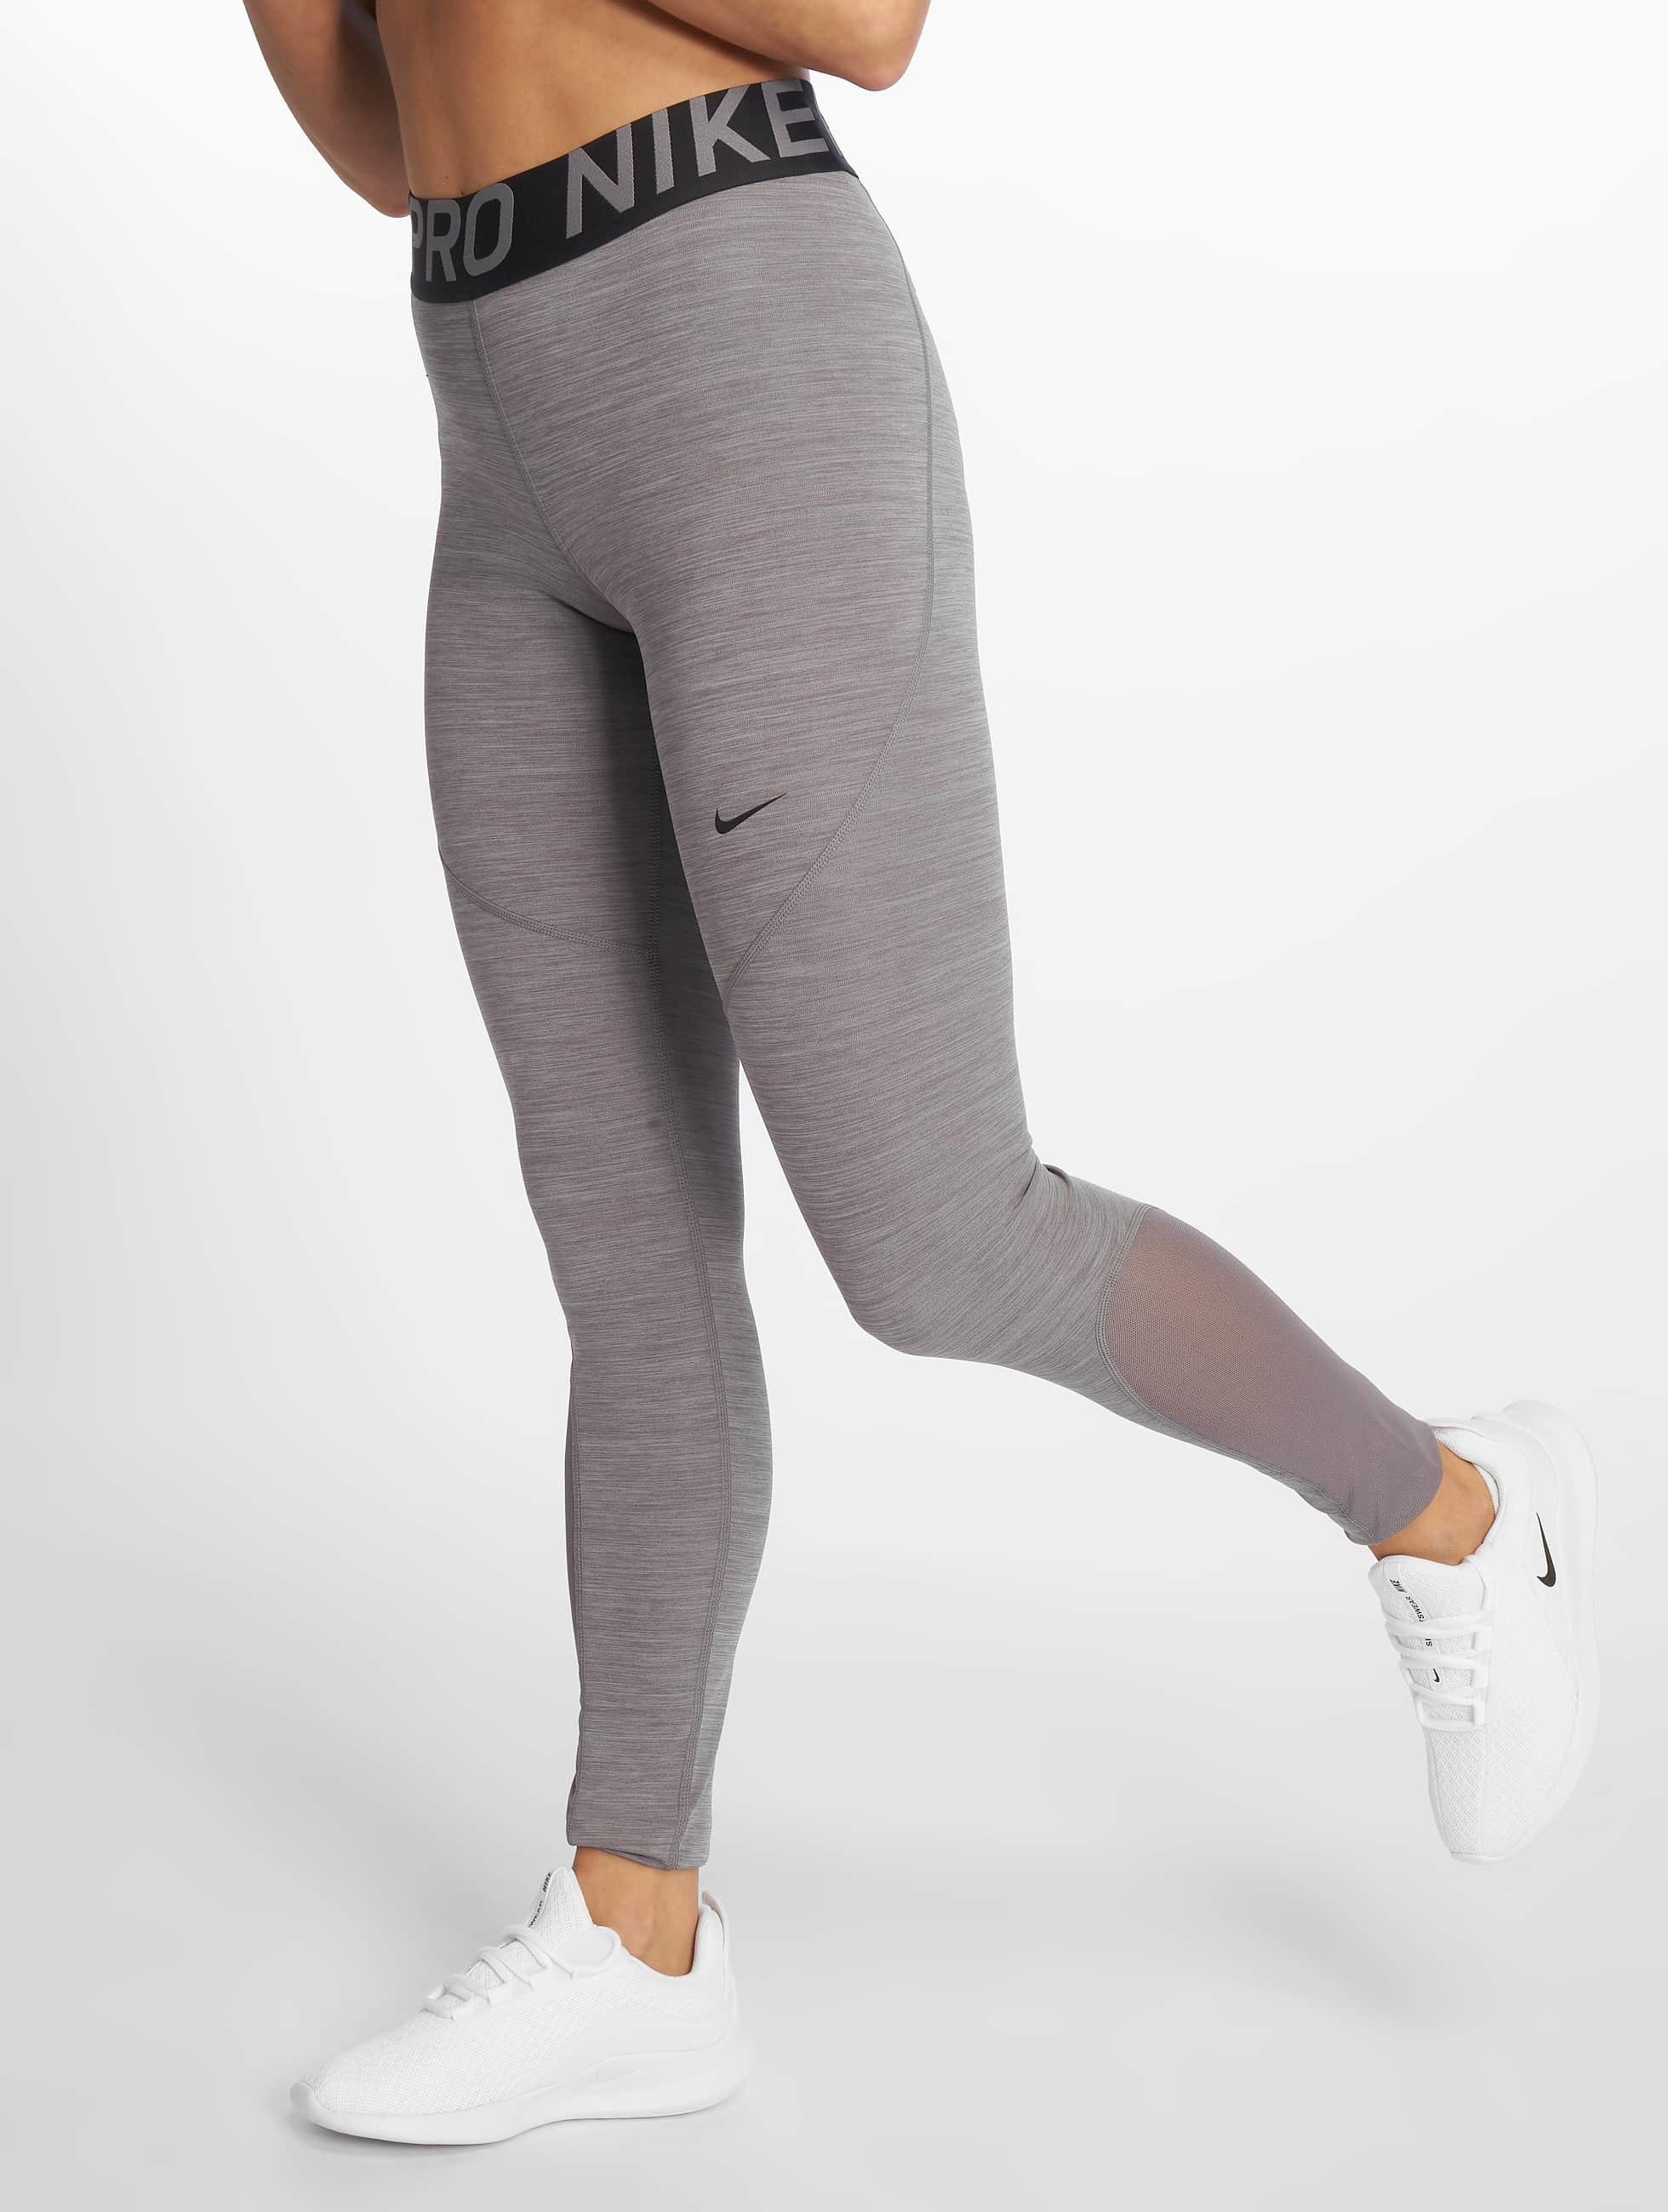 Picotear En la actualidad ANTES DE CRISTO.  Nike | Pro gris Femme Legging 586925